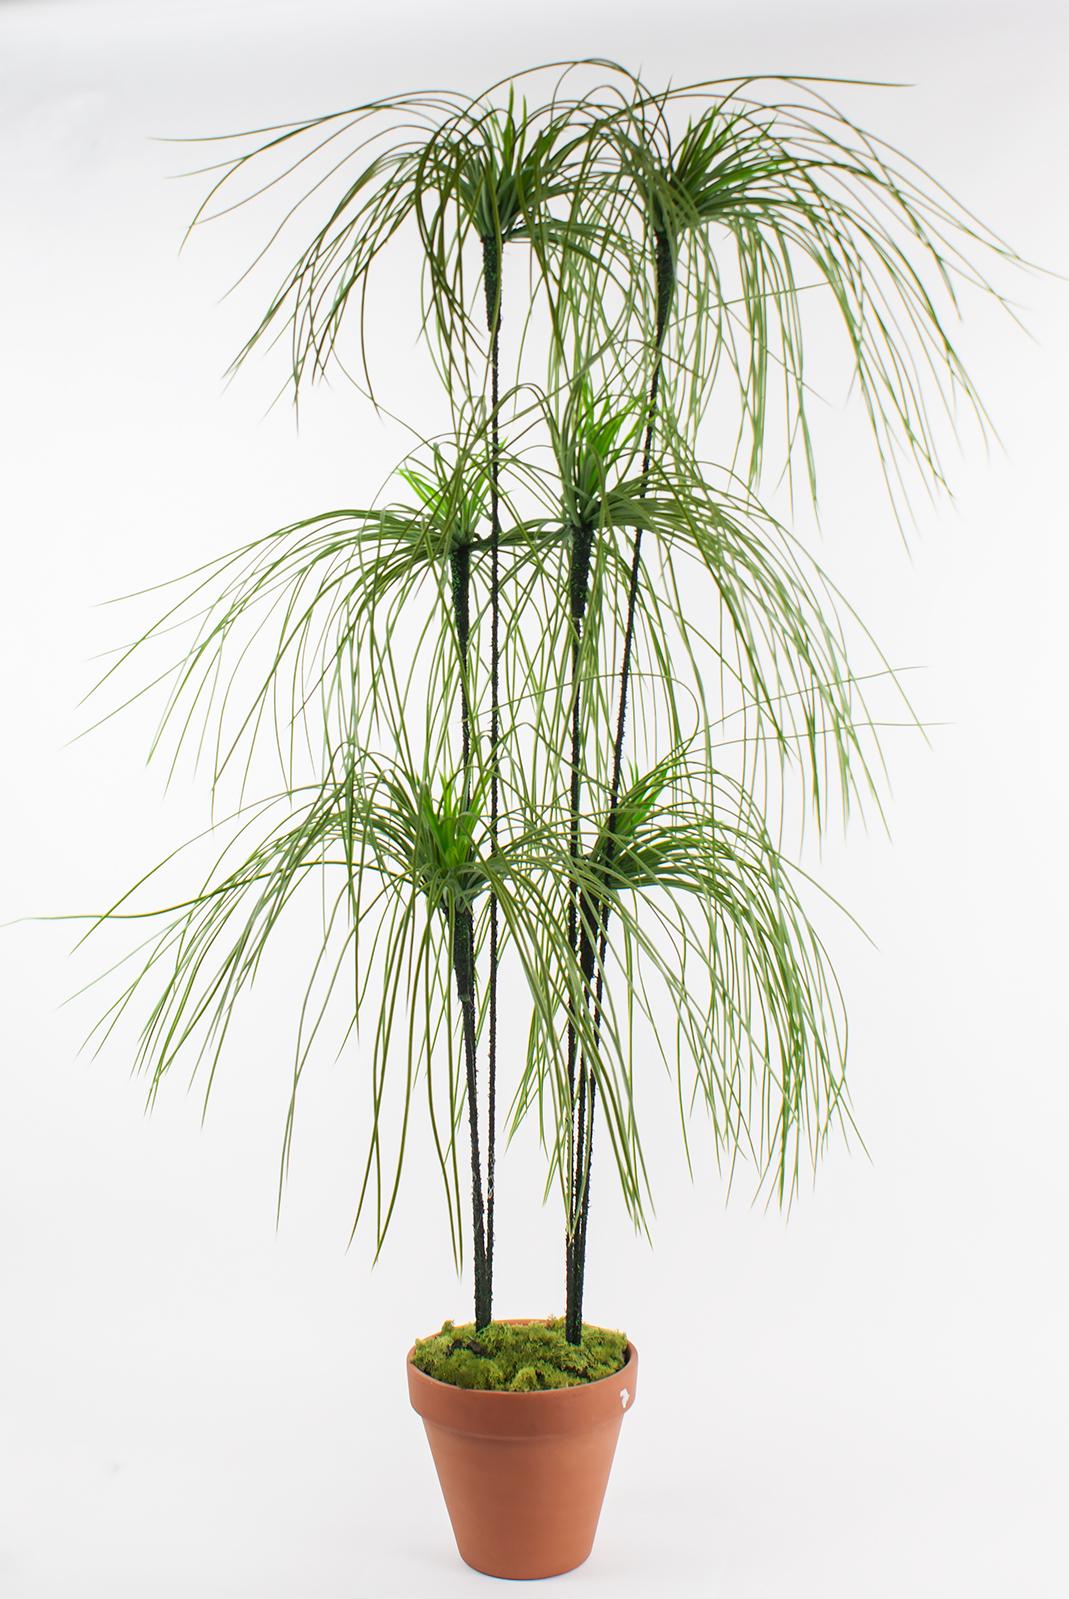 papyrus kunstpflanze xxl gras dekopflanze mit blumentopf 120cm hoch keramik neu ebay. Black Bedroom Furniture Sets. Home Design Ideas